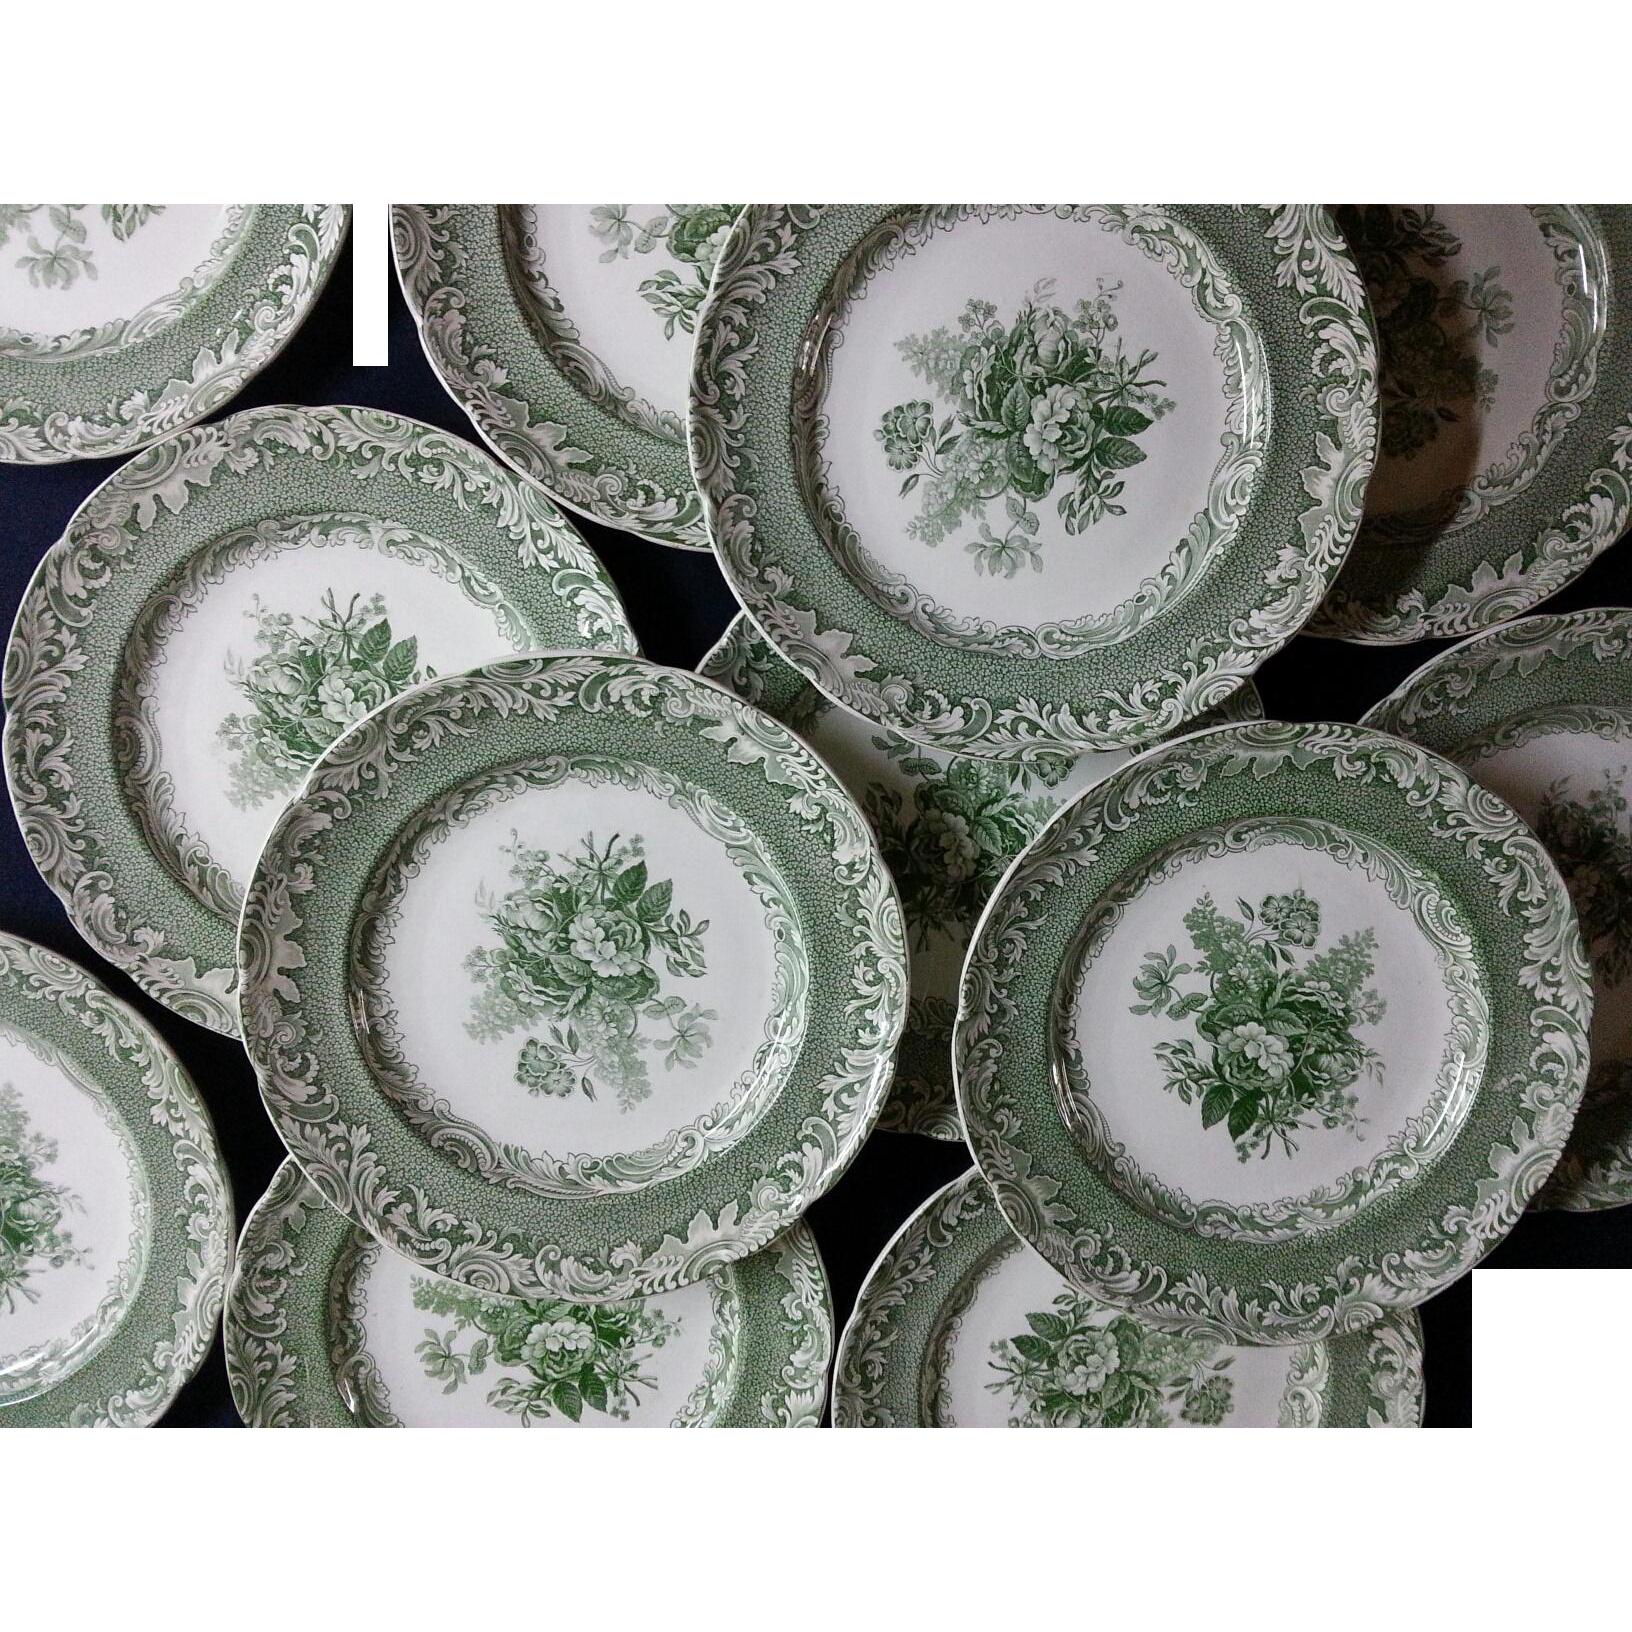 Copeland Garrett Late Spode Green Transfer Printed Set Of 12 Plates Spode Green Pottery Transferware